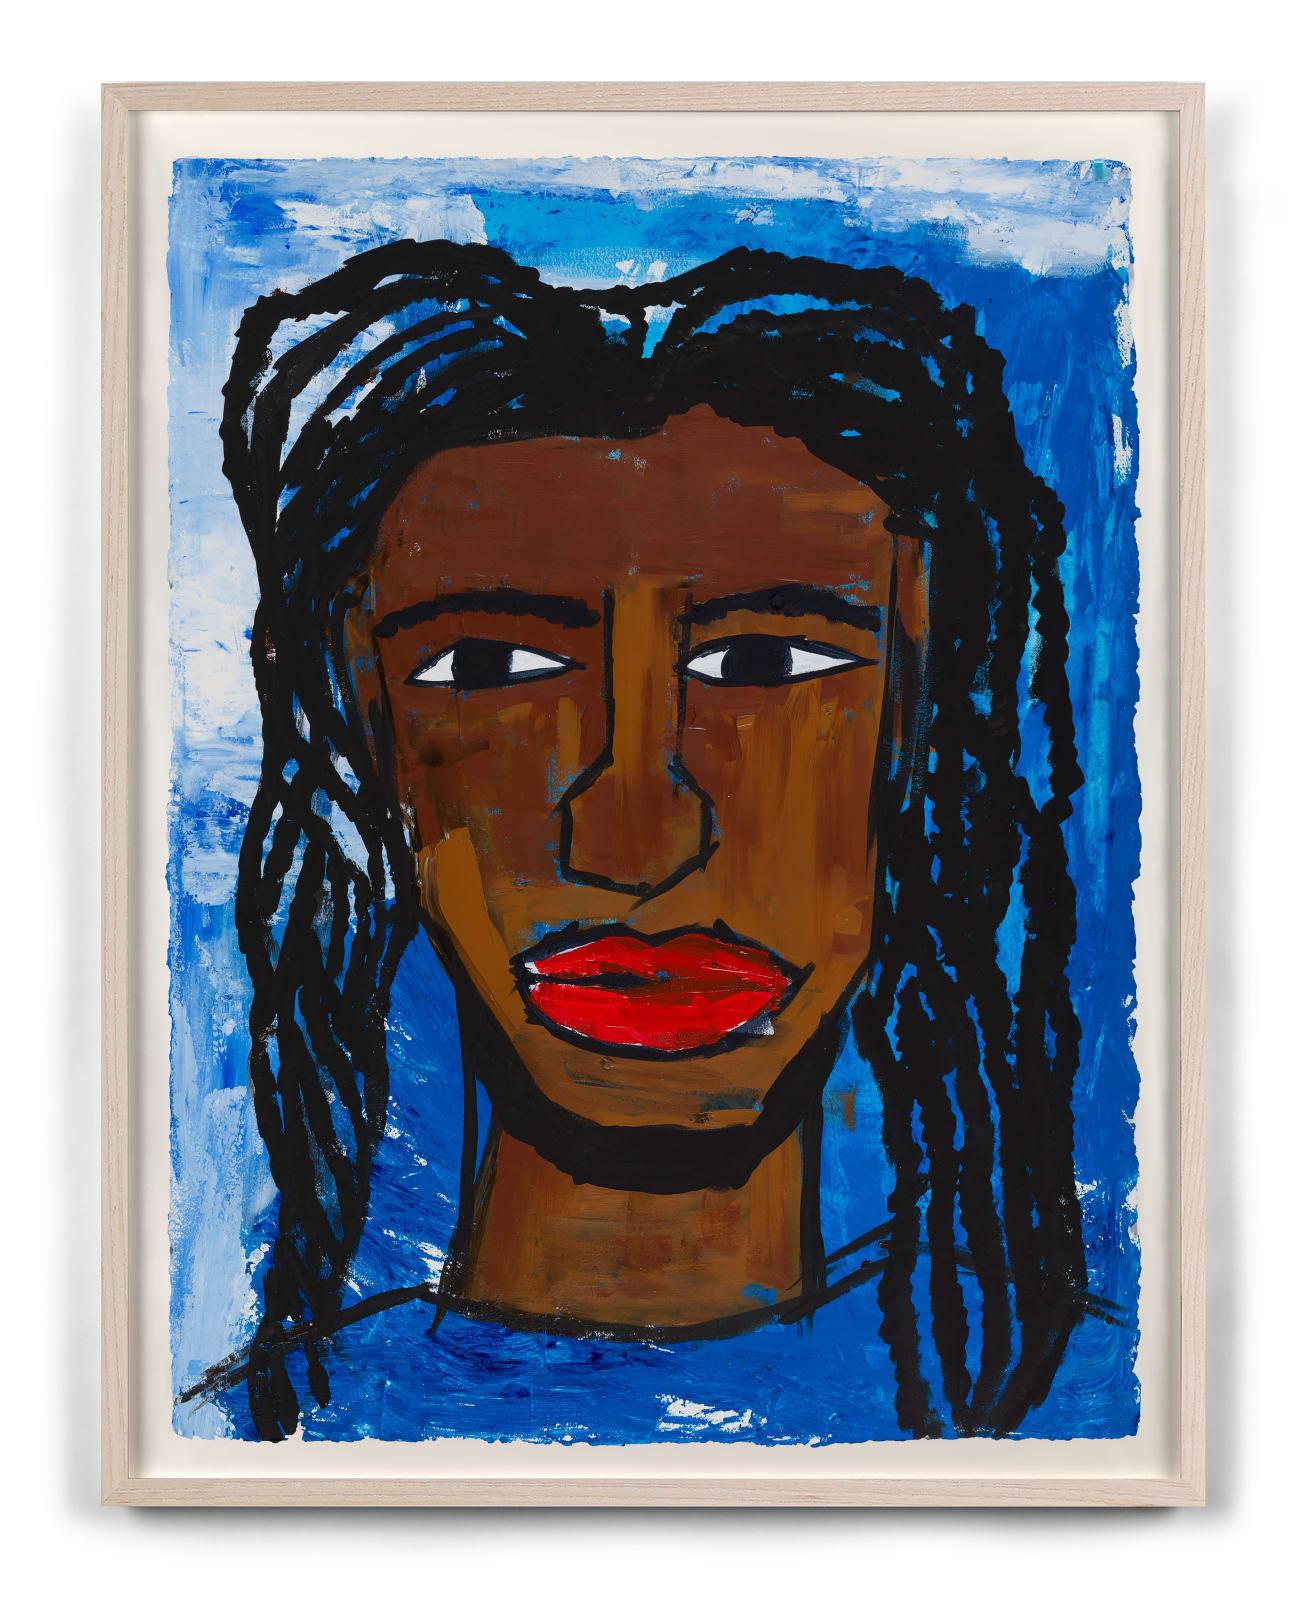 "<div class=""artist"">Leilah Babirye</div><div class=""title_and_year""><span class=""title"">Kuchu Ndagamuntu (Queer Identity Card)</span><span class=""year"">, 2021</span></div>"